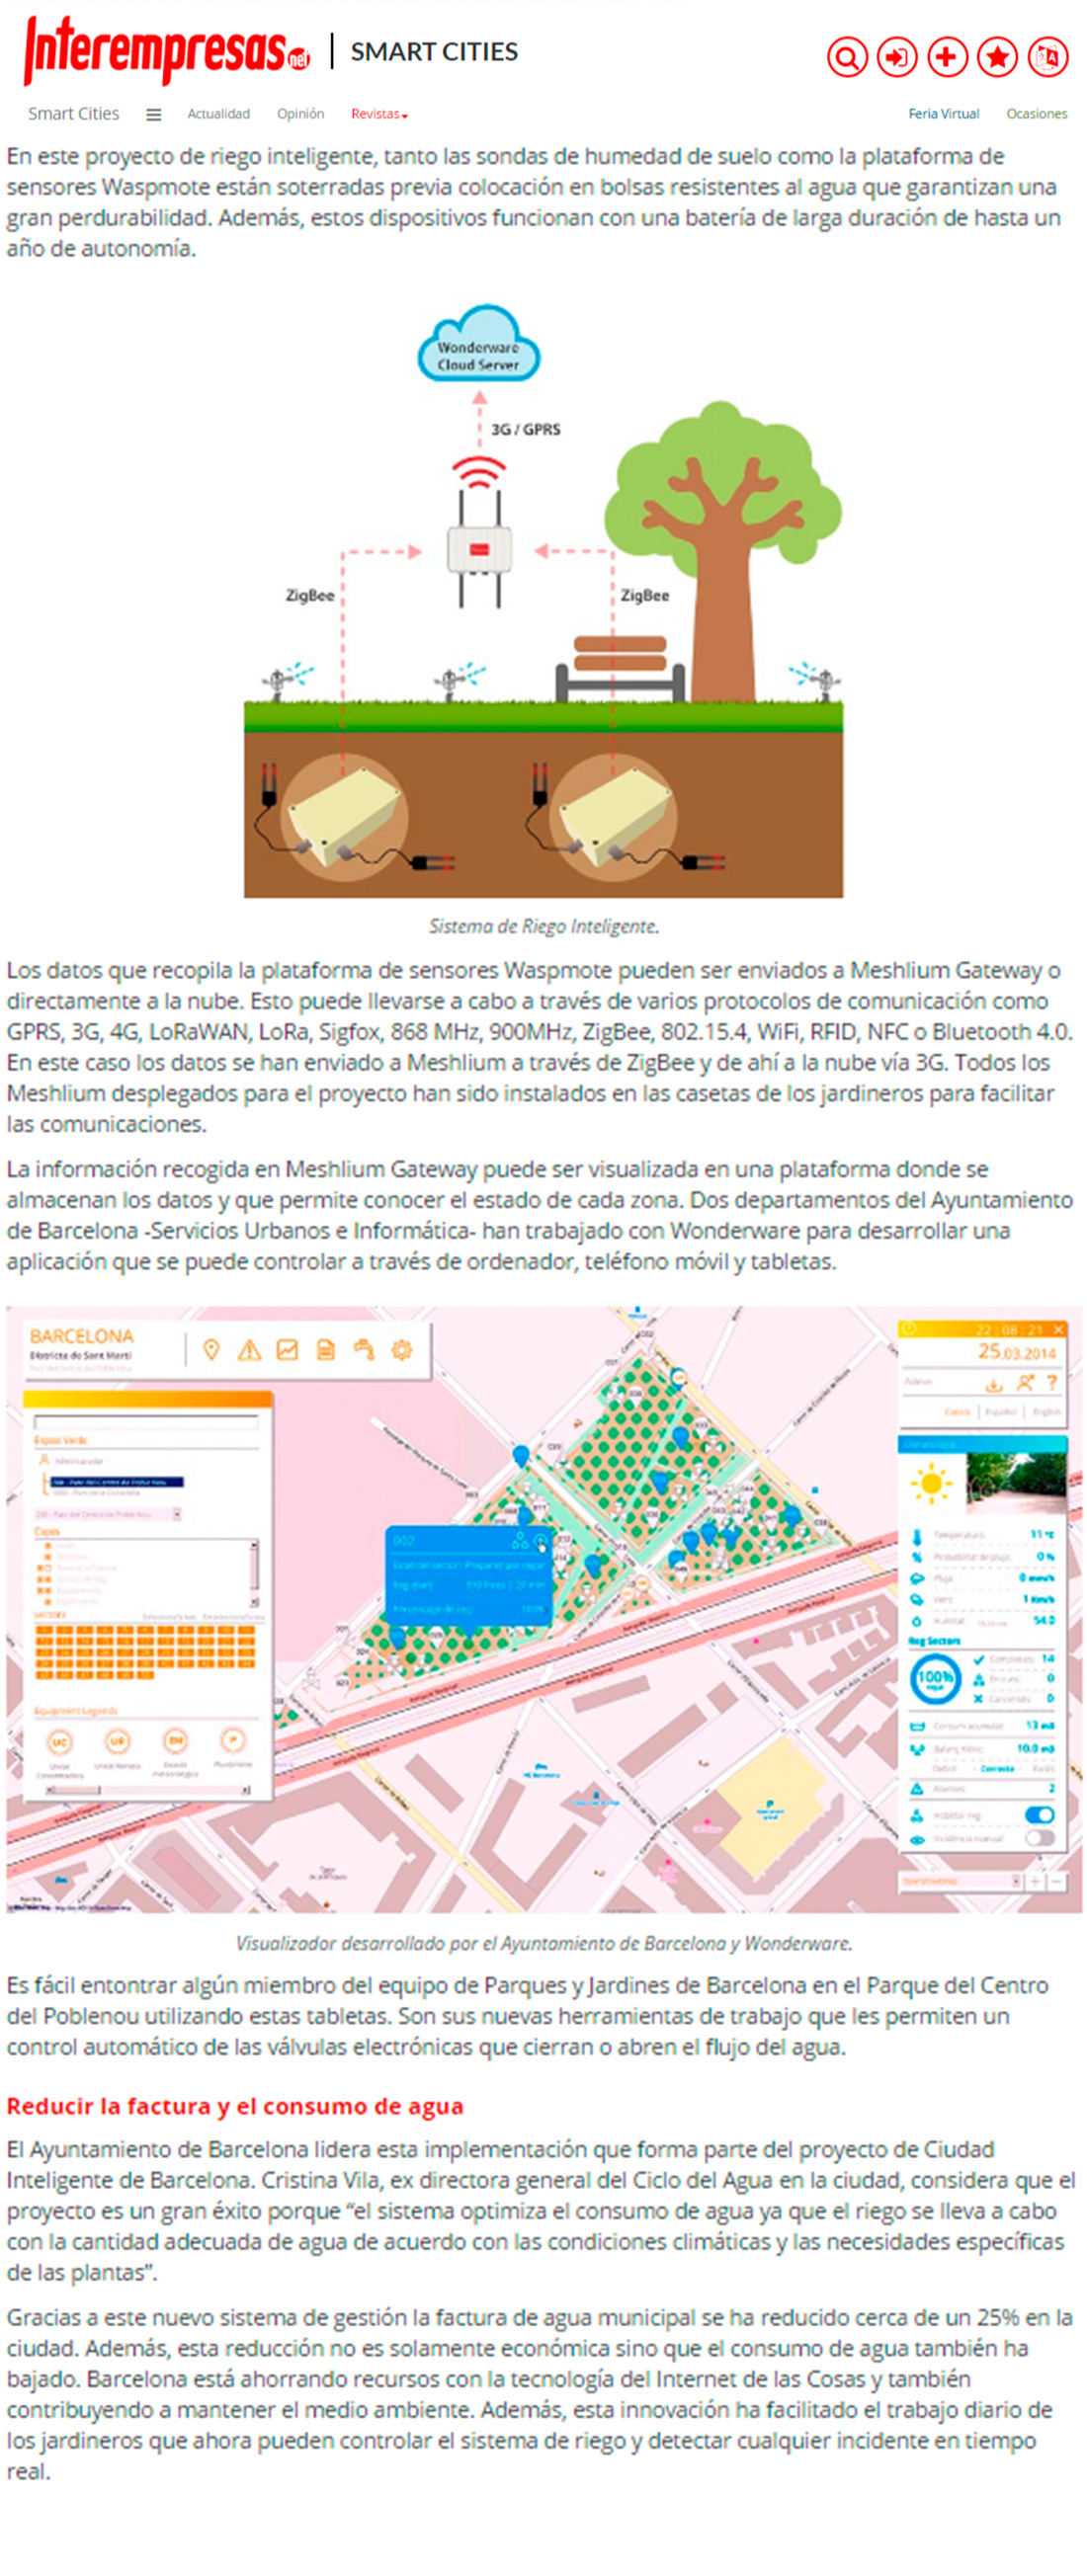 Interempresas.net – Sistema de riego inteligente en Barcelona